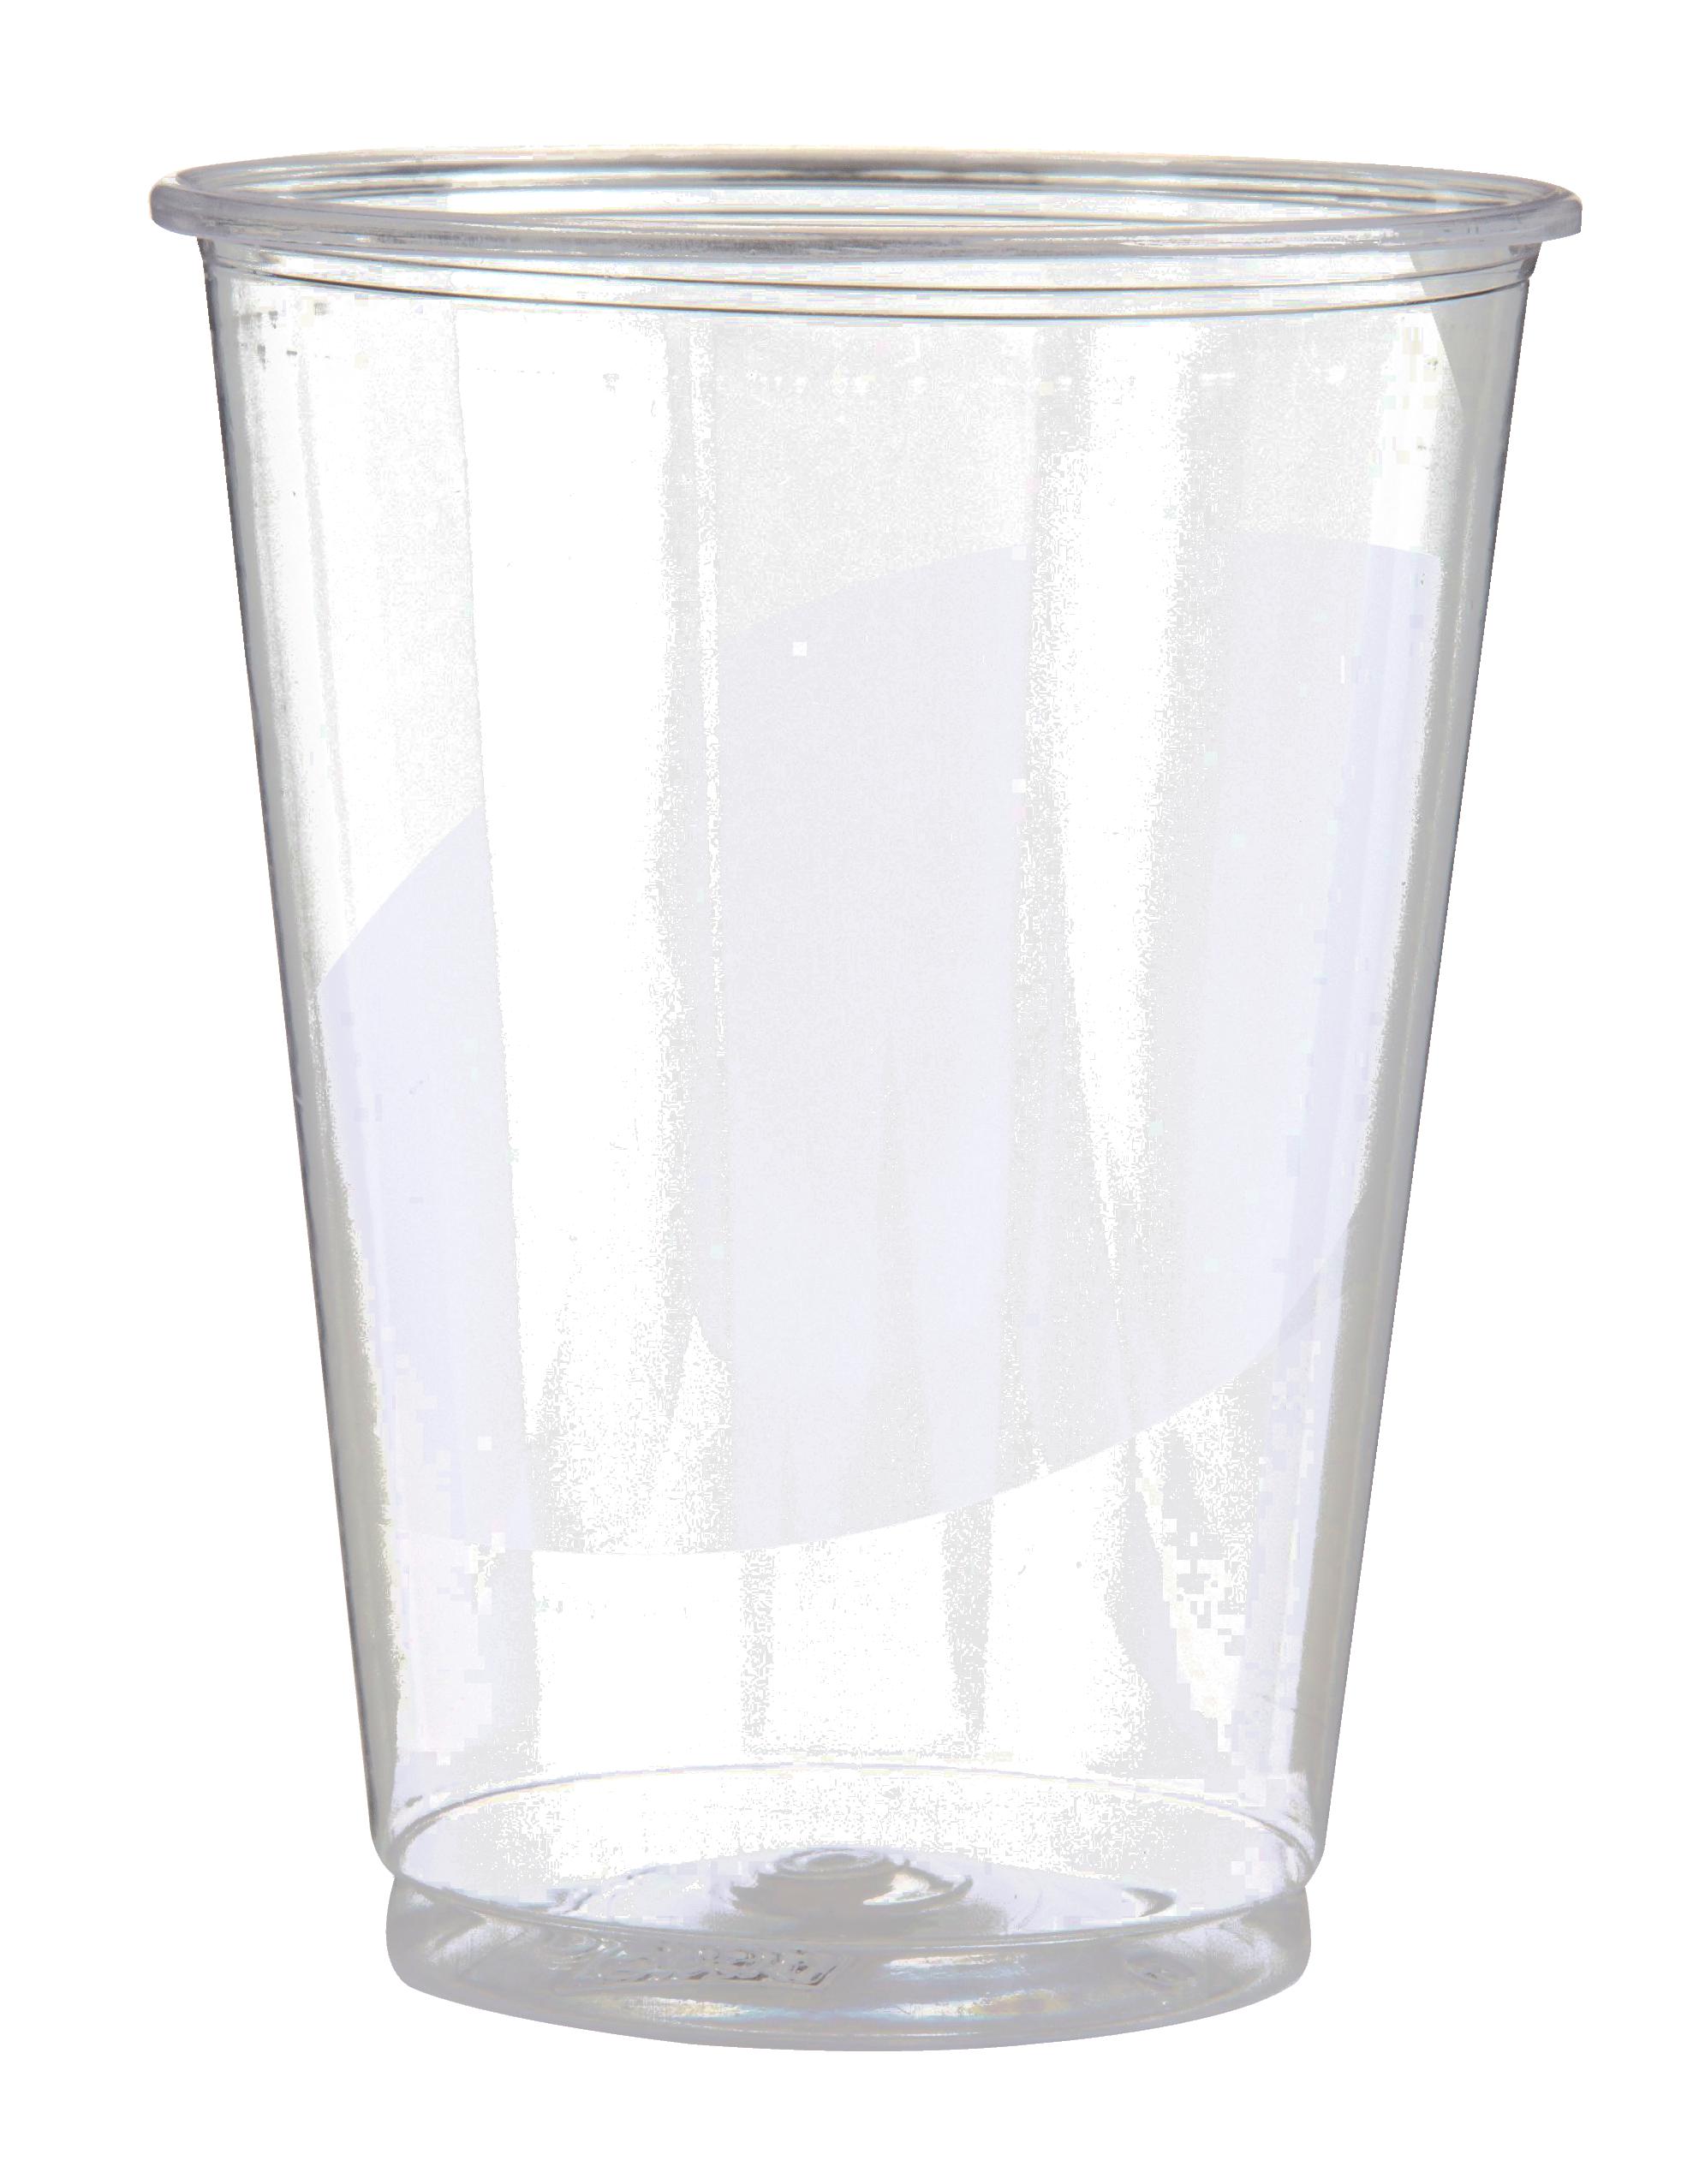 plastic cup png image purepng free transparent cc0 png image library. Black Bedroom Furniture Sets. Home Design Ideas